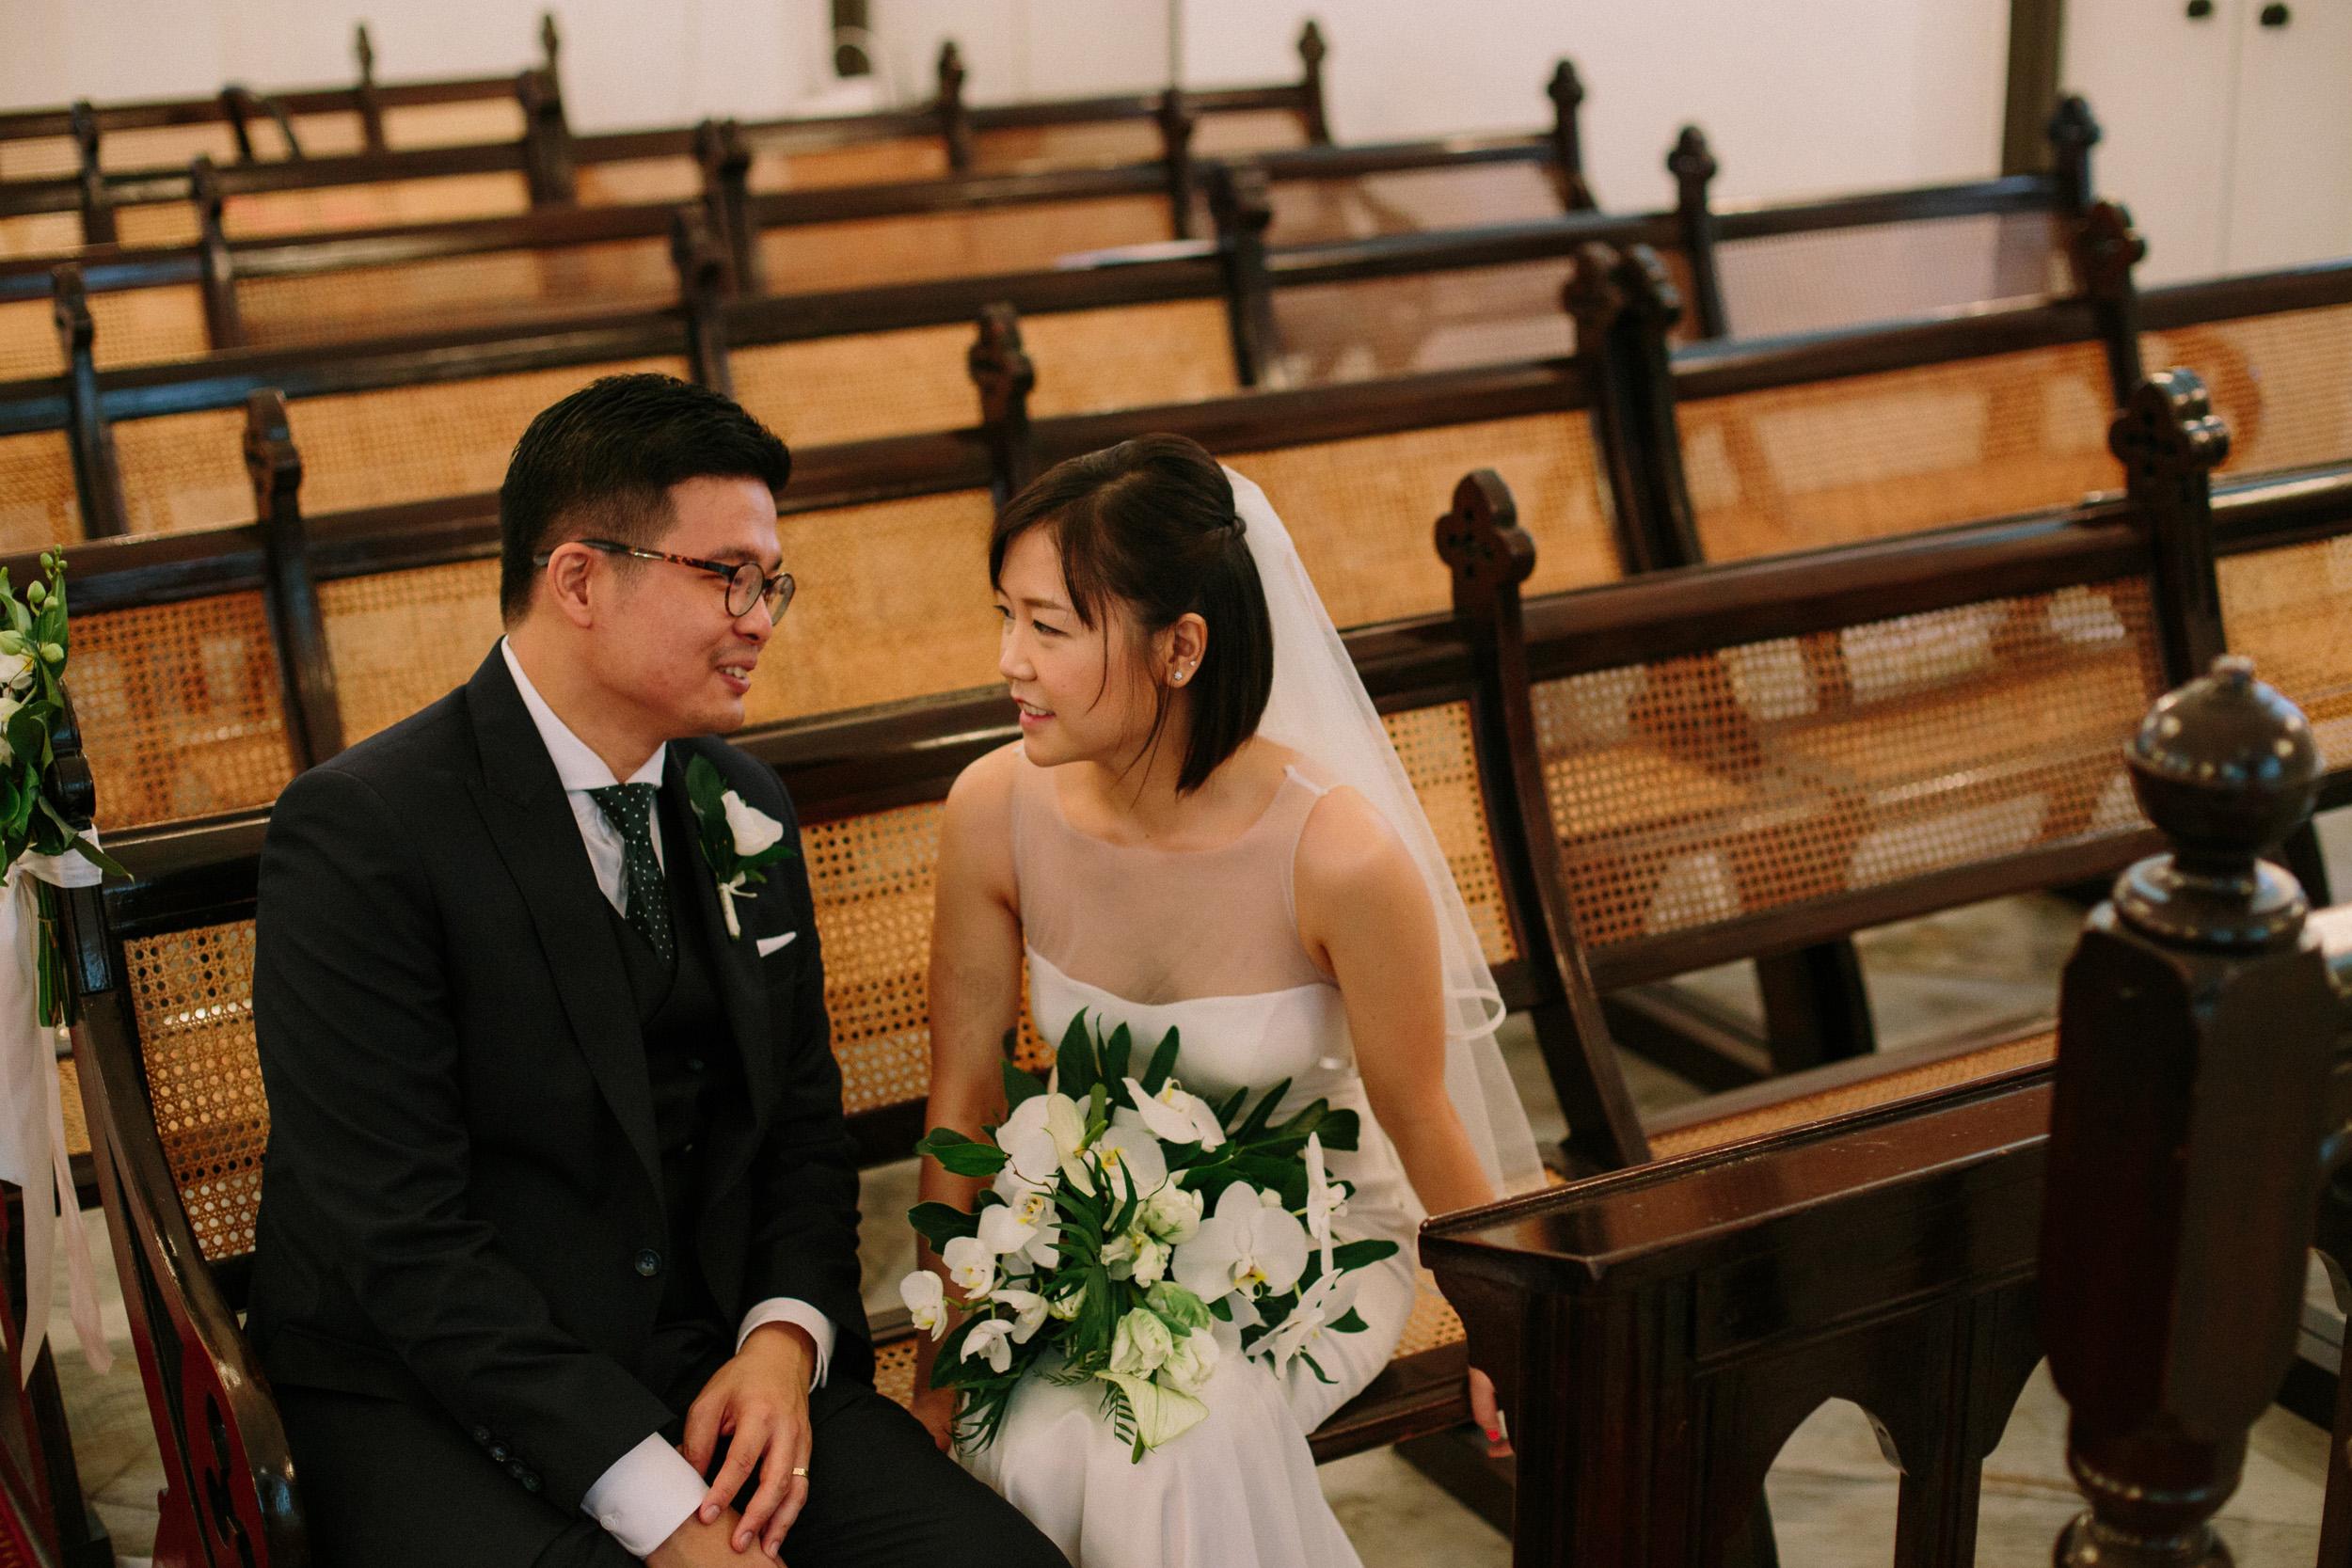 singapore-wedding-photographer-photography-wmt2017-052.jpg